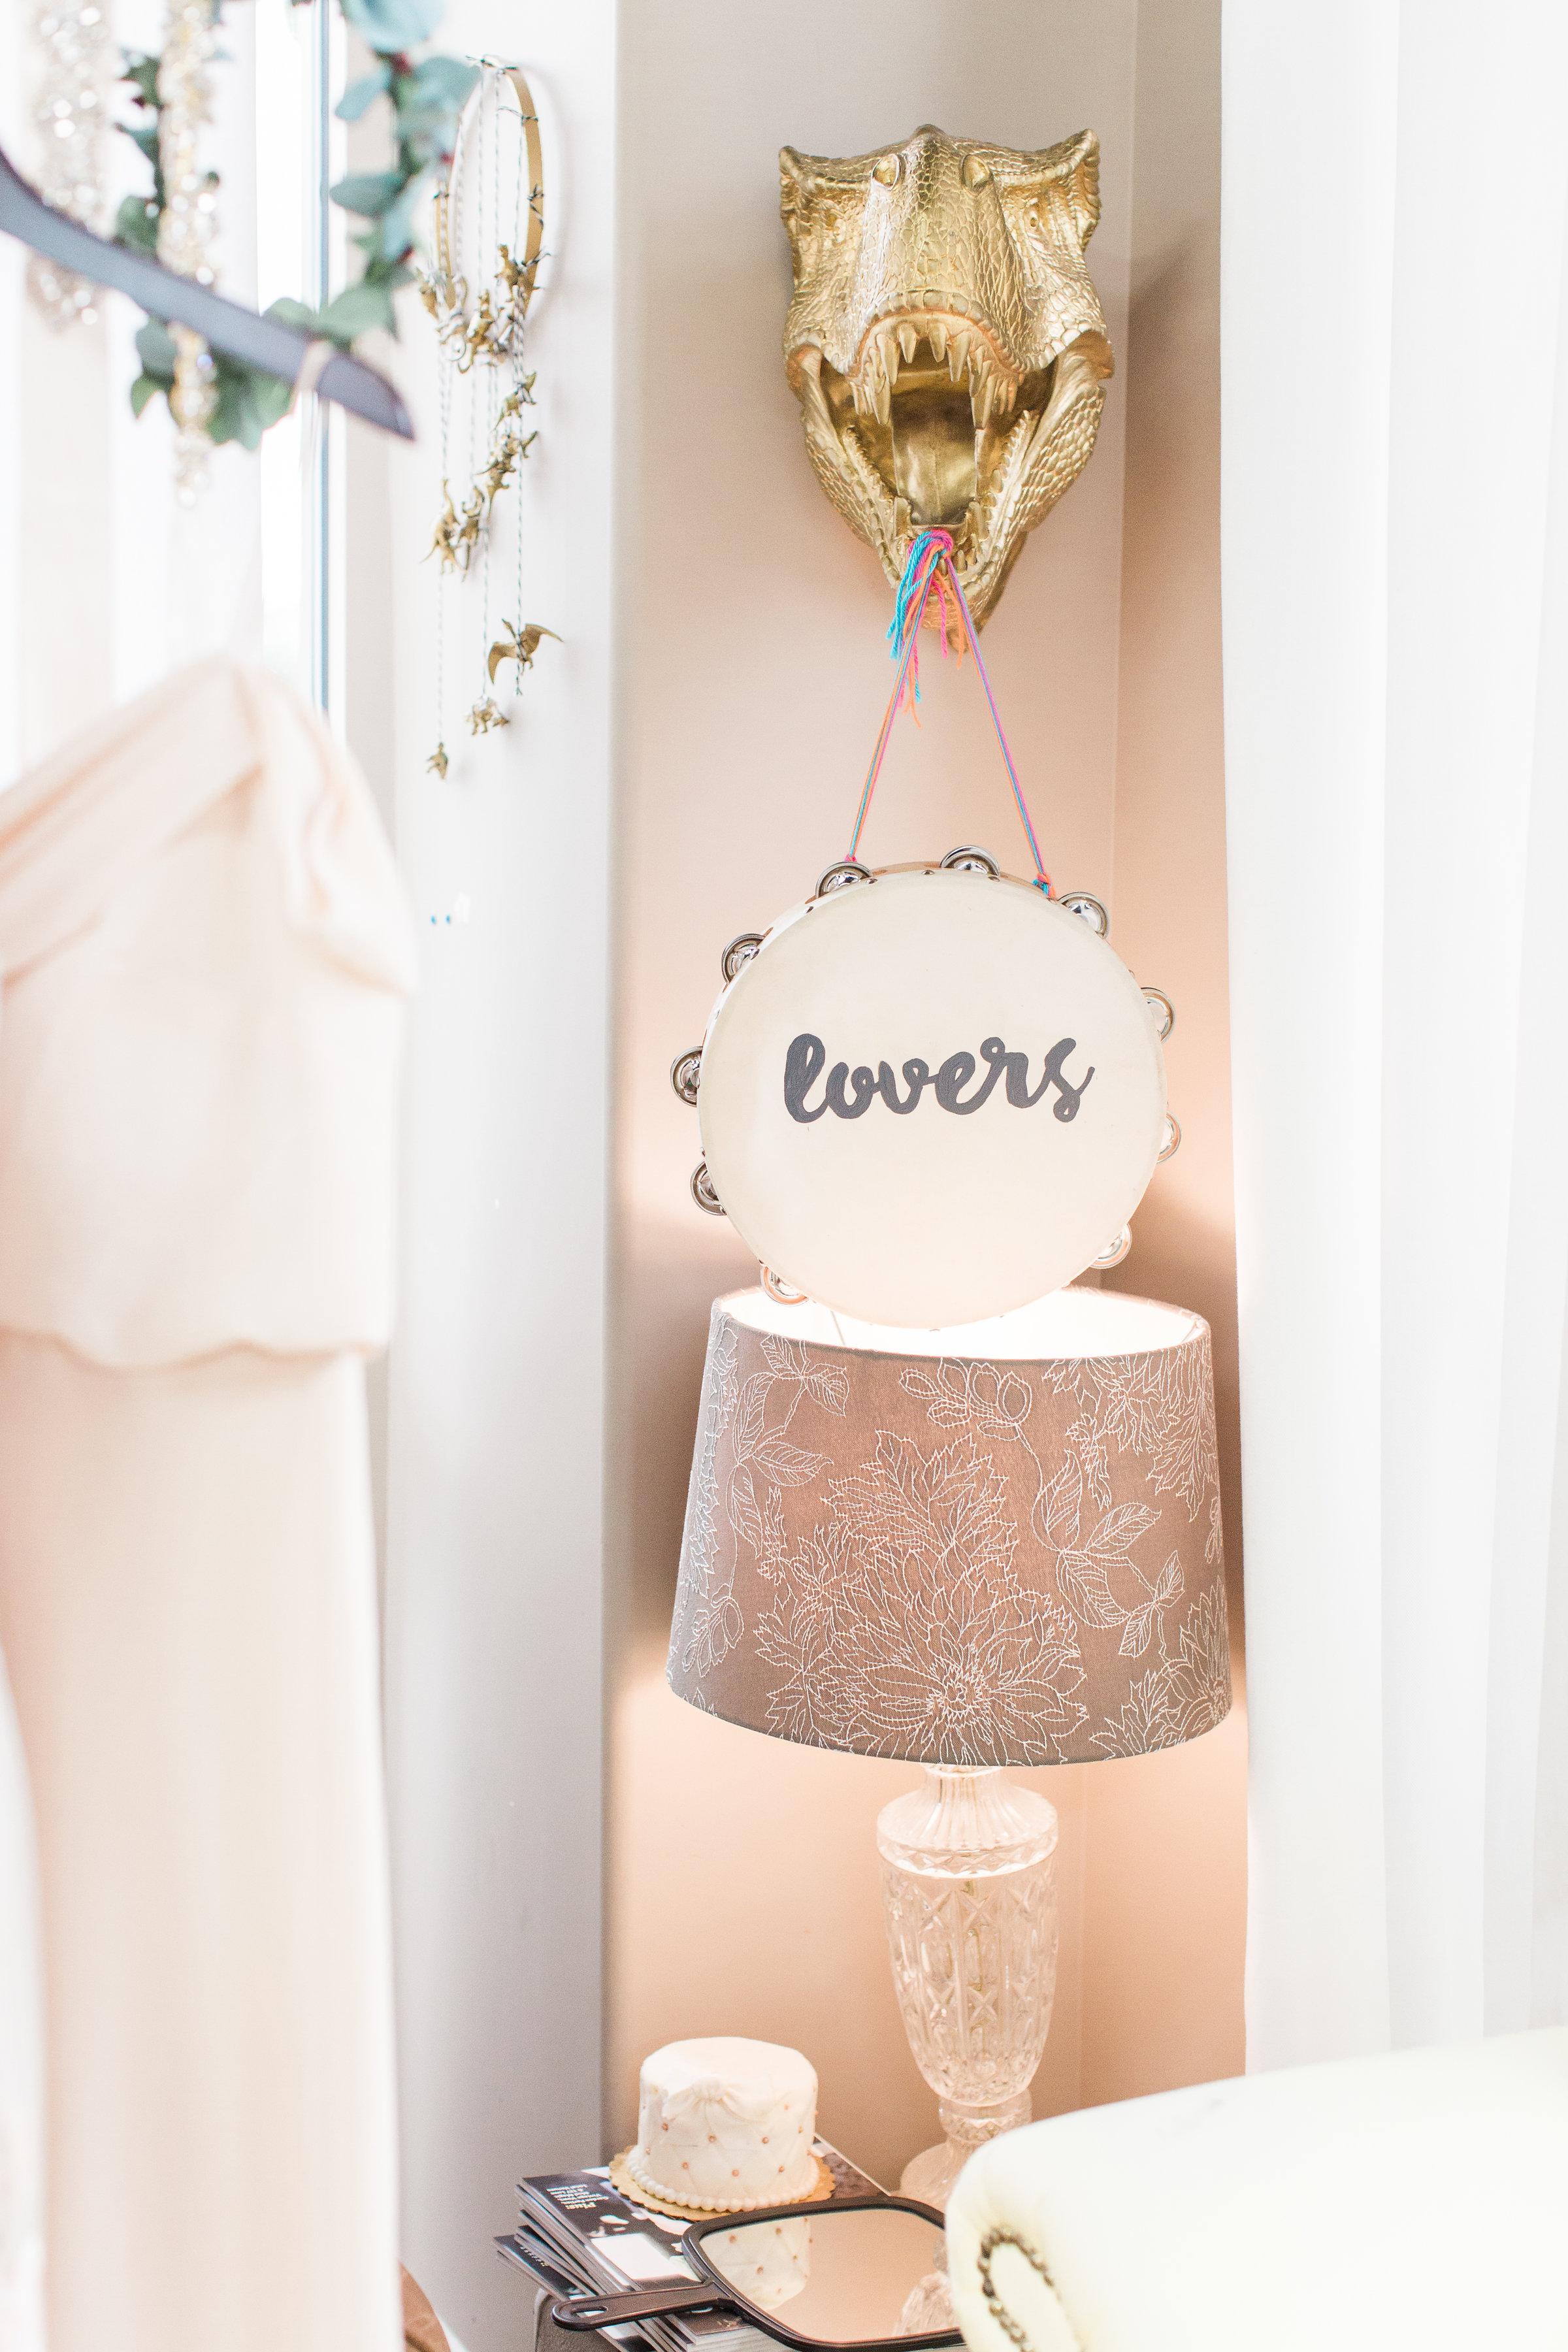 savannah-bridal-boutique-ivory-and-beau-savannah-bride-savannah-bridal-shop-wedding-dress-savannah-weddings-wedding-dress-savannah-aptbphotography-aptbphoto-veils-tiaras-bridal-jewelery-18.jpg